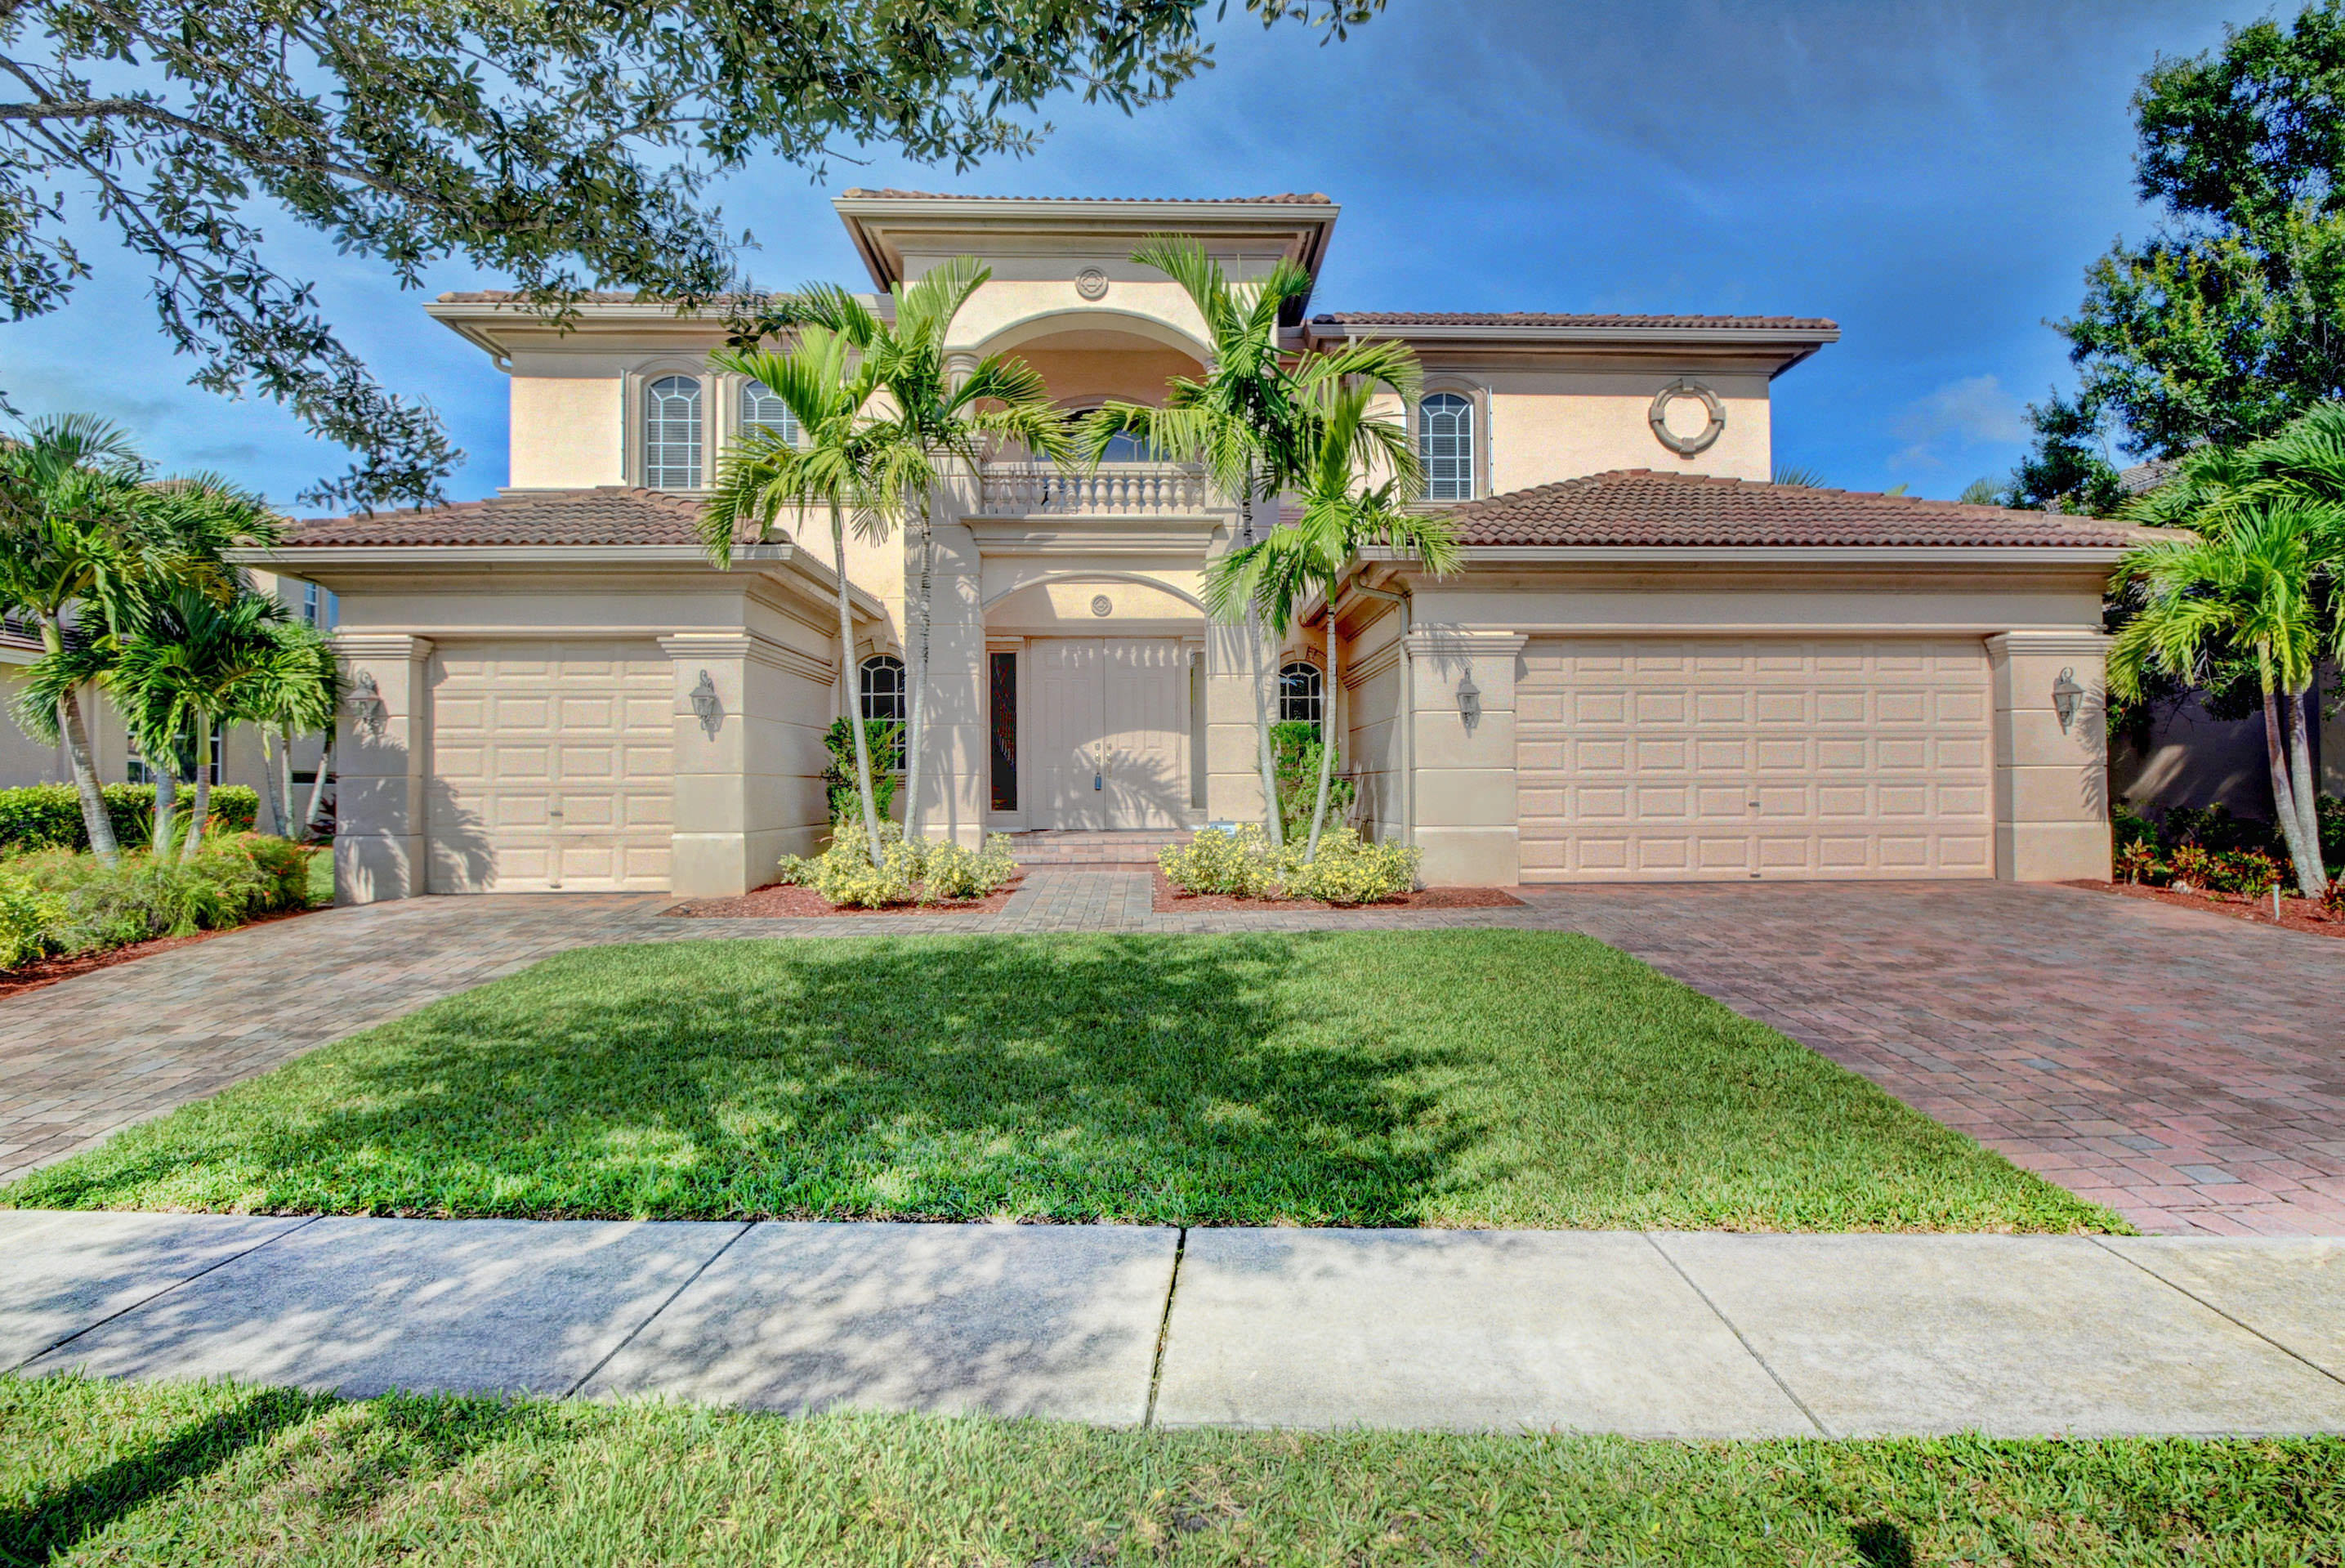 Photo of 591 Glenfield Way, Royal Palm Beach, FL 33411